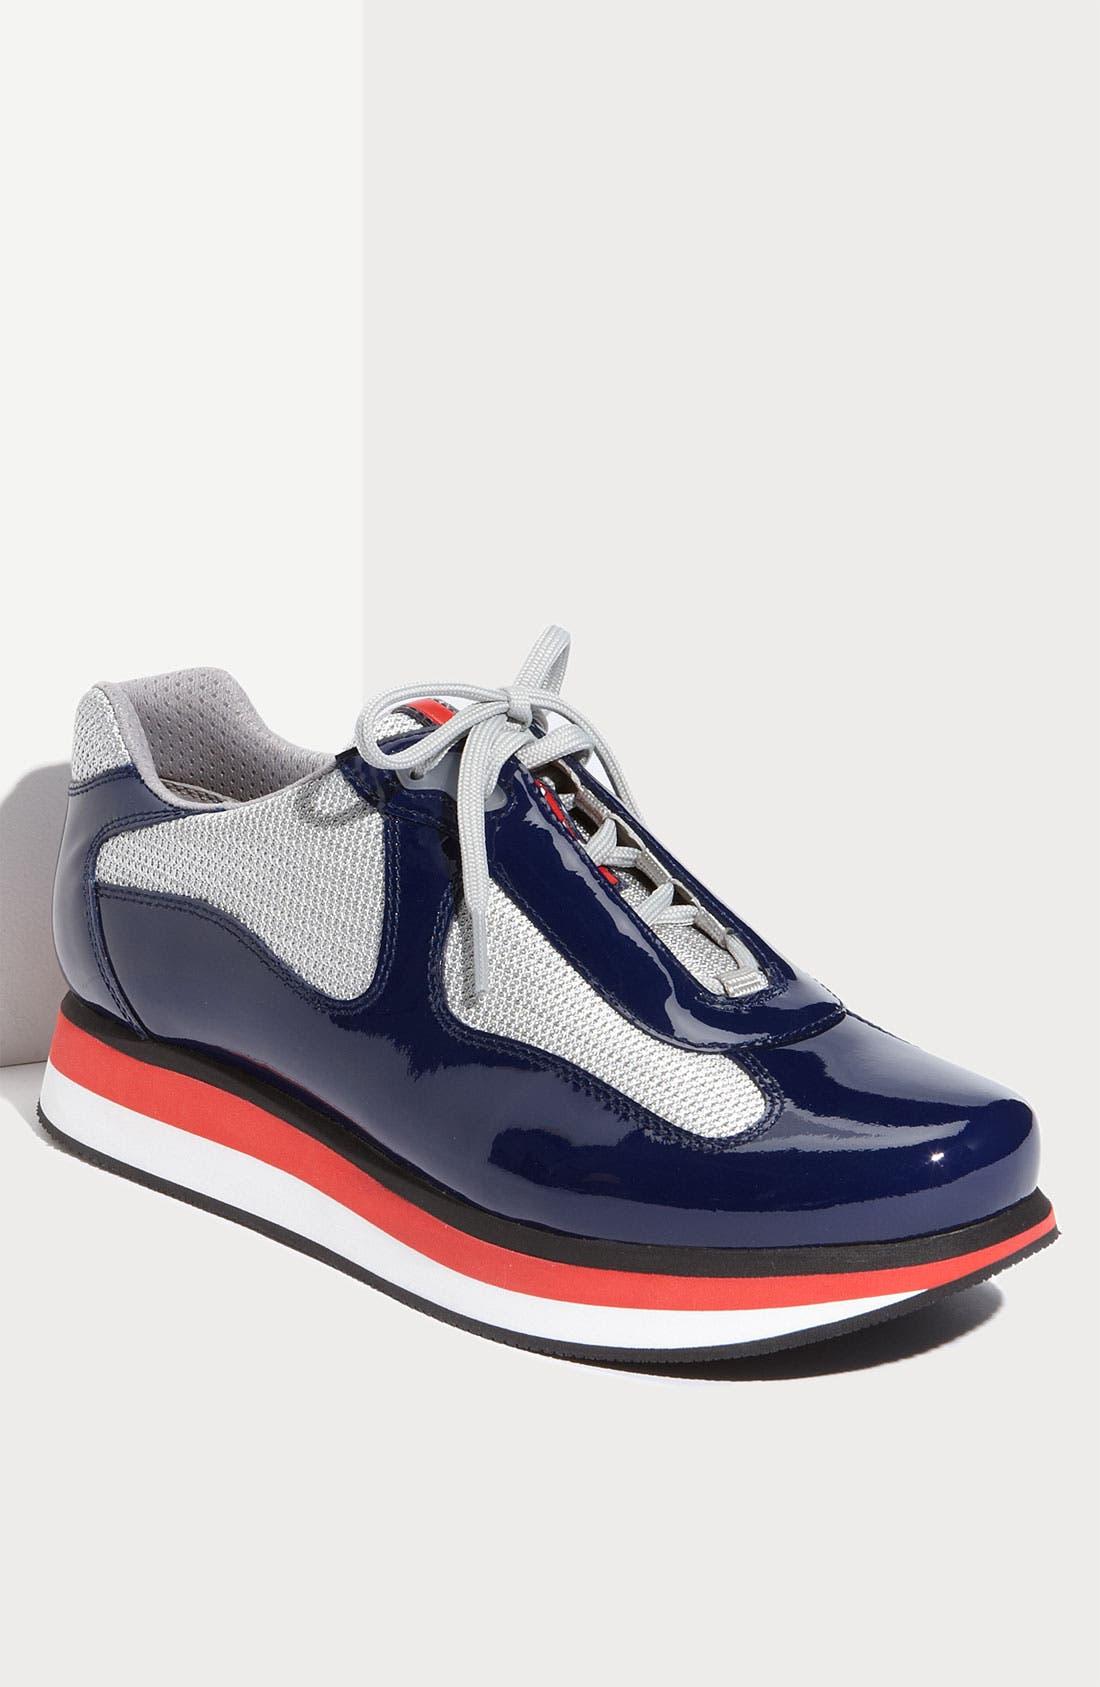 Main Image - Prada 'Punta Ala' Double Sole Sneaker